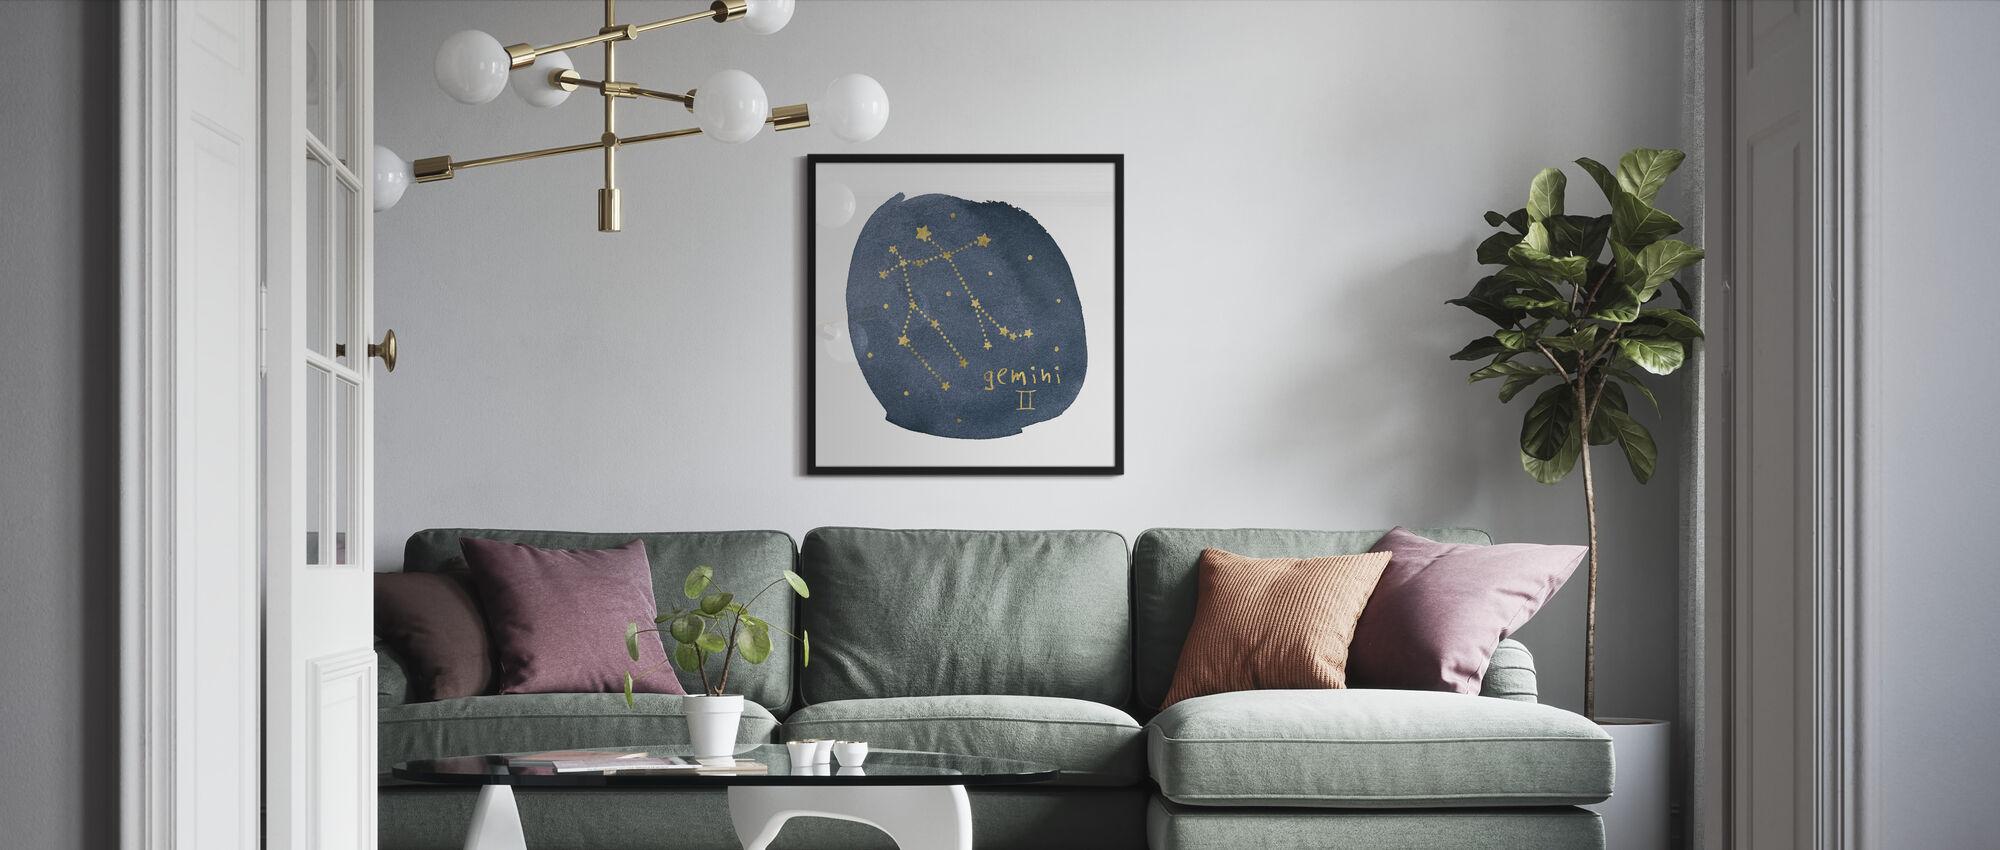 Horoskop Gemini - Innrammet bilde - Stue